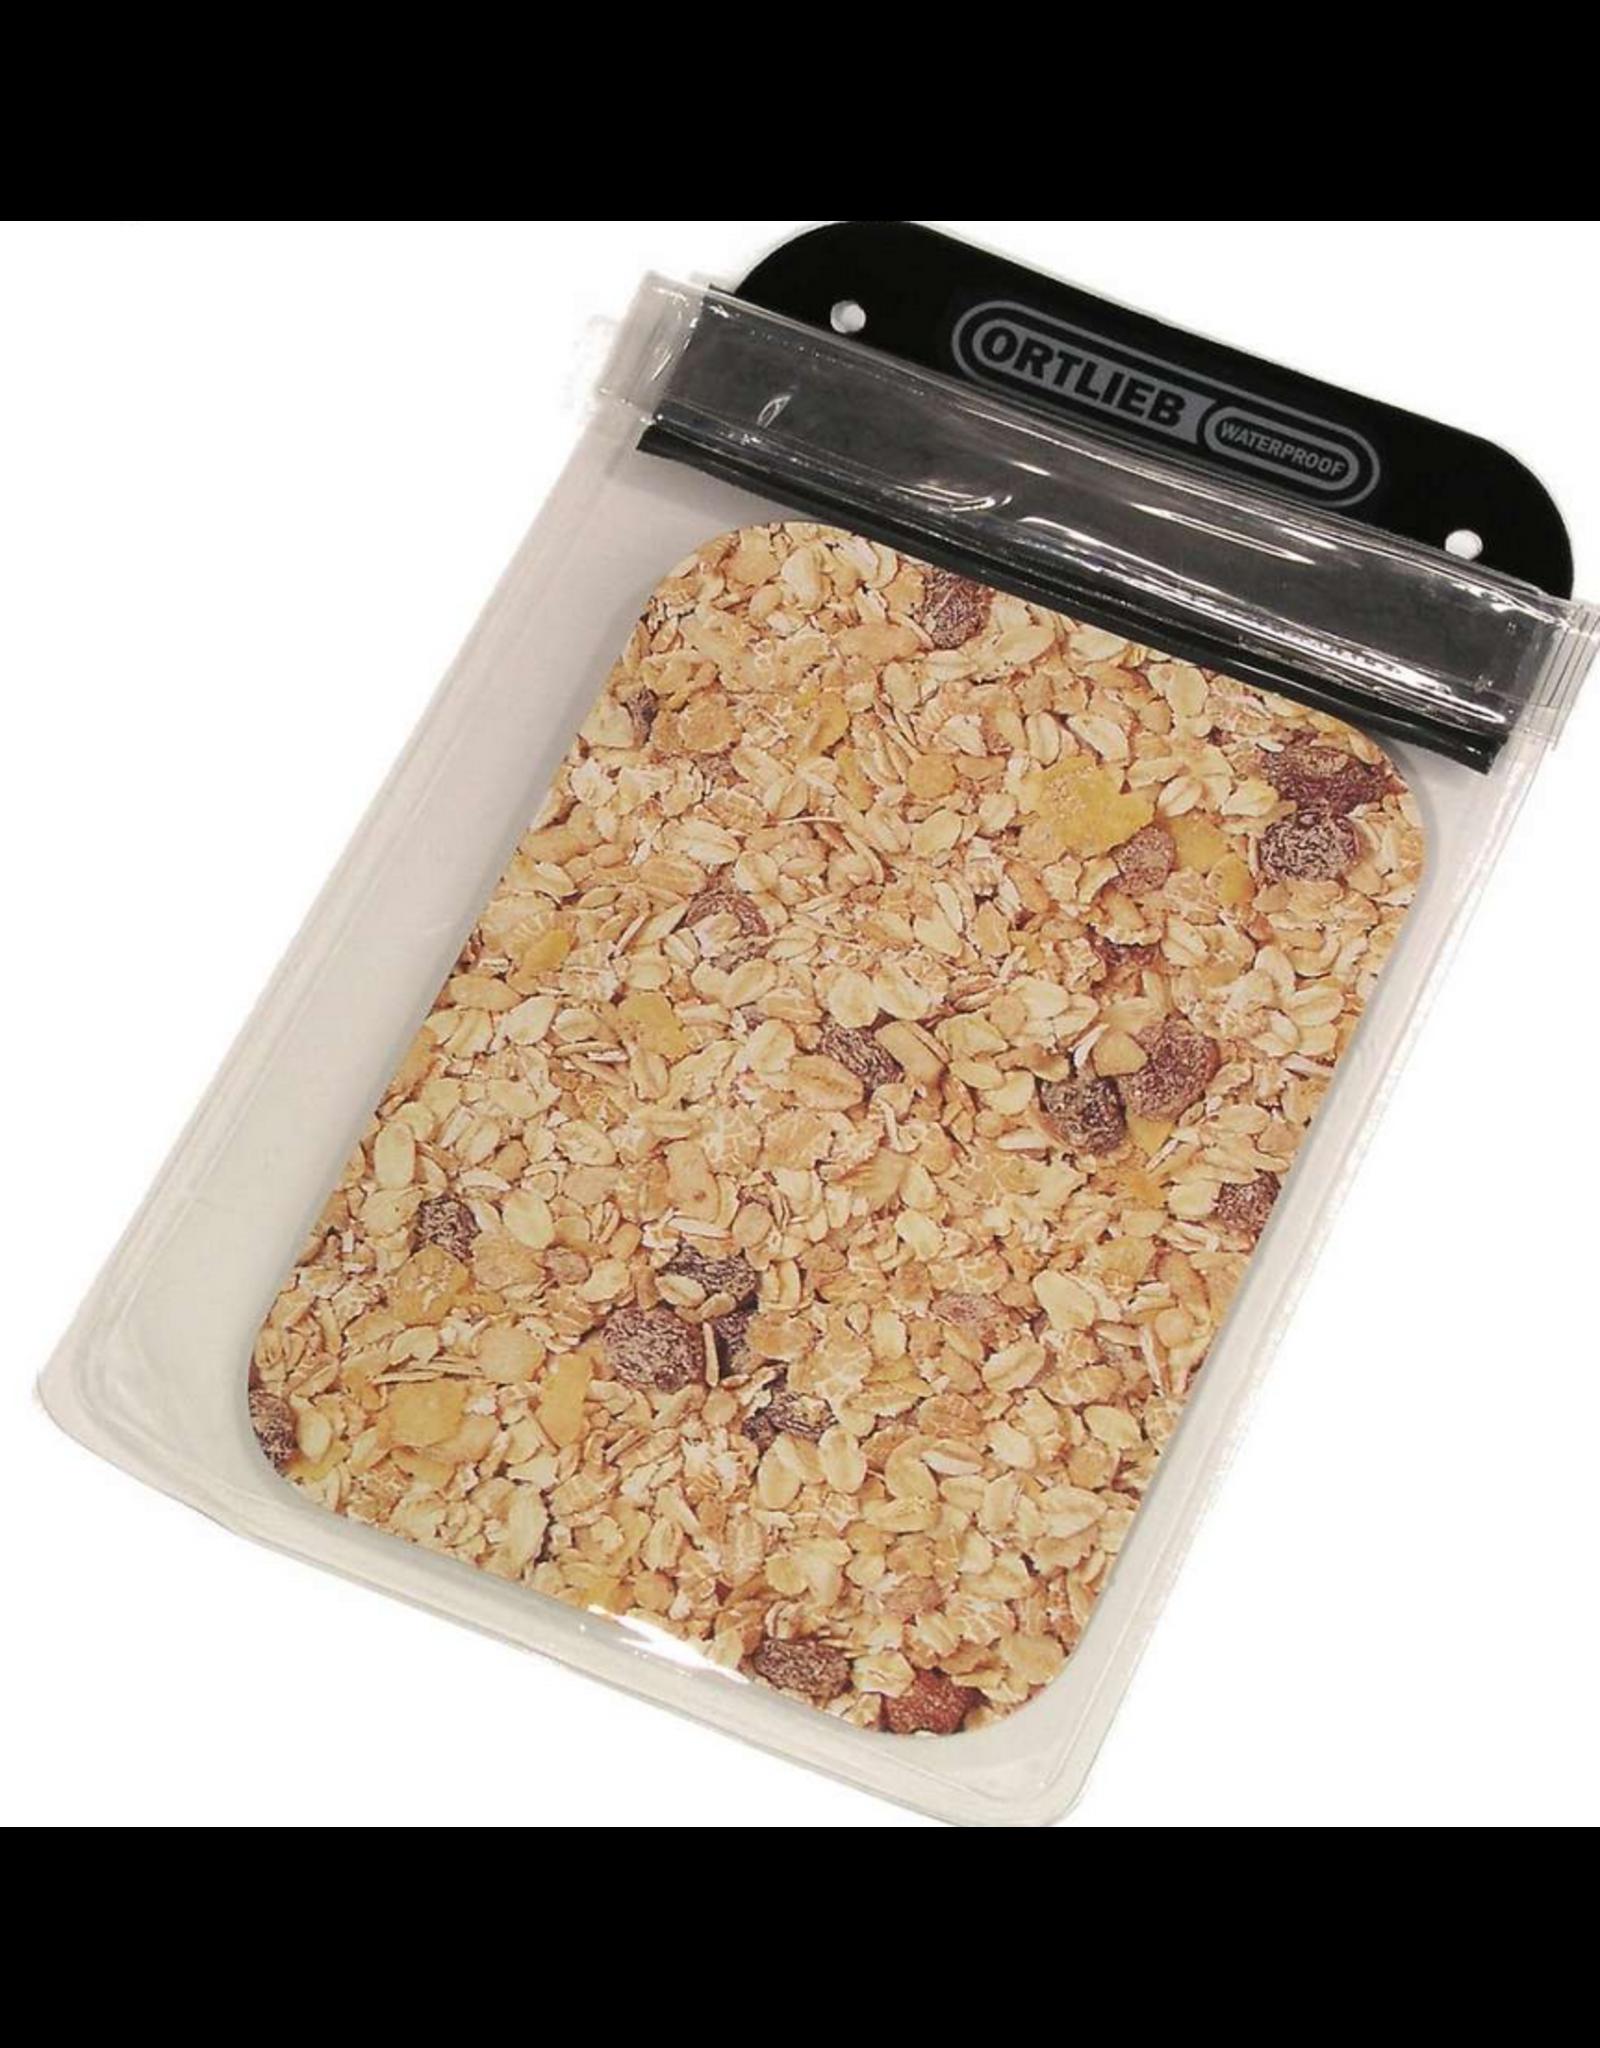 Ortlieb Ortlieb Snack/ Mask Bag A6